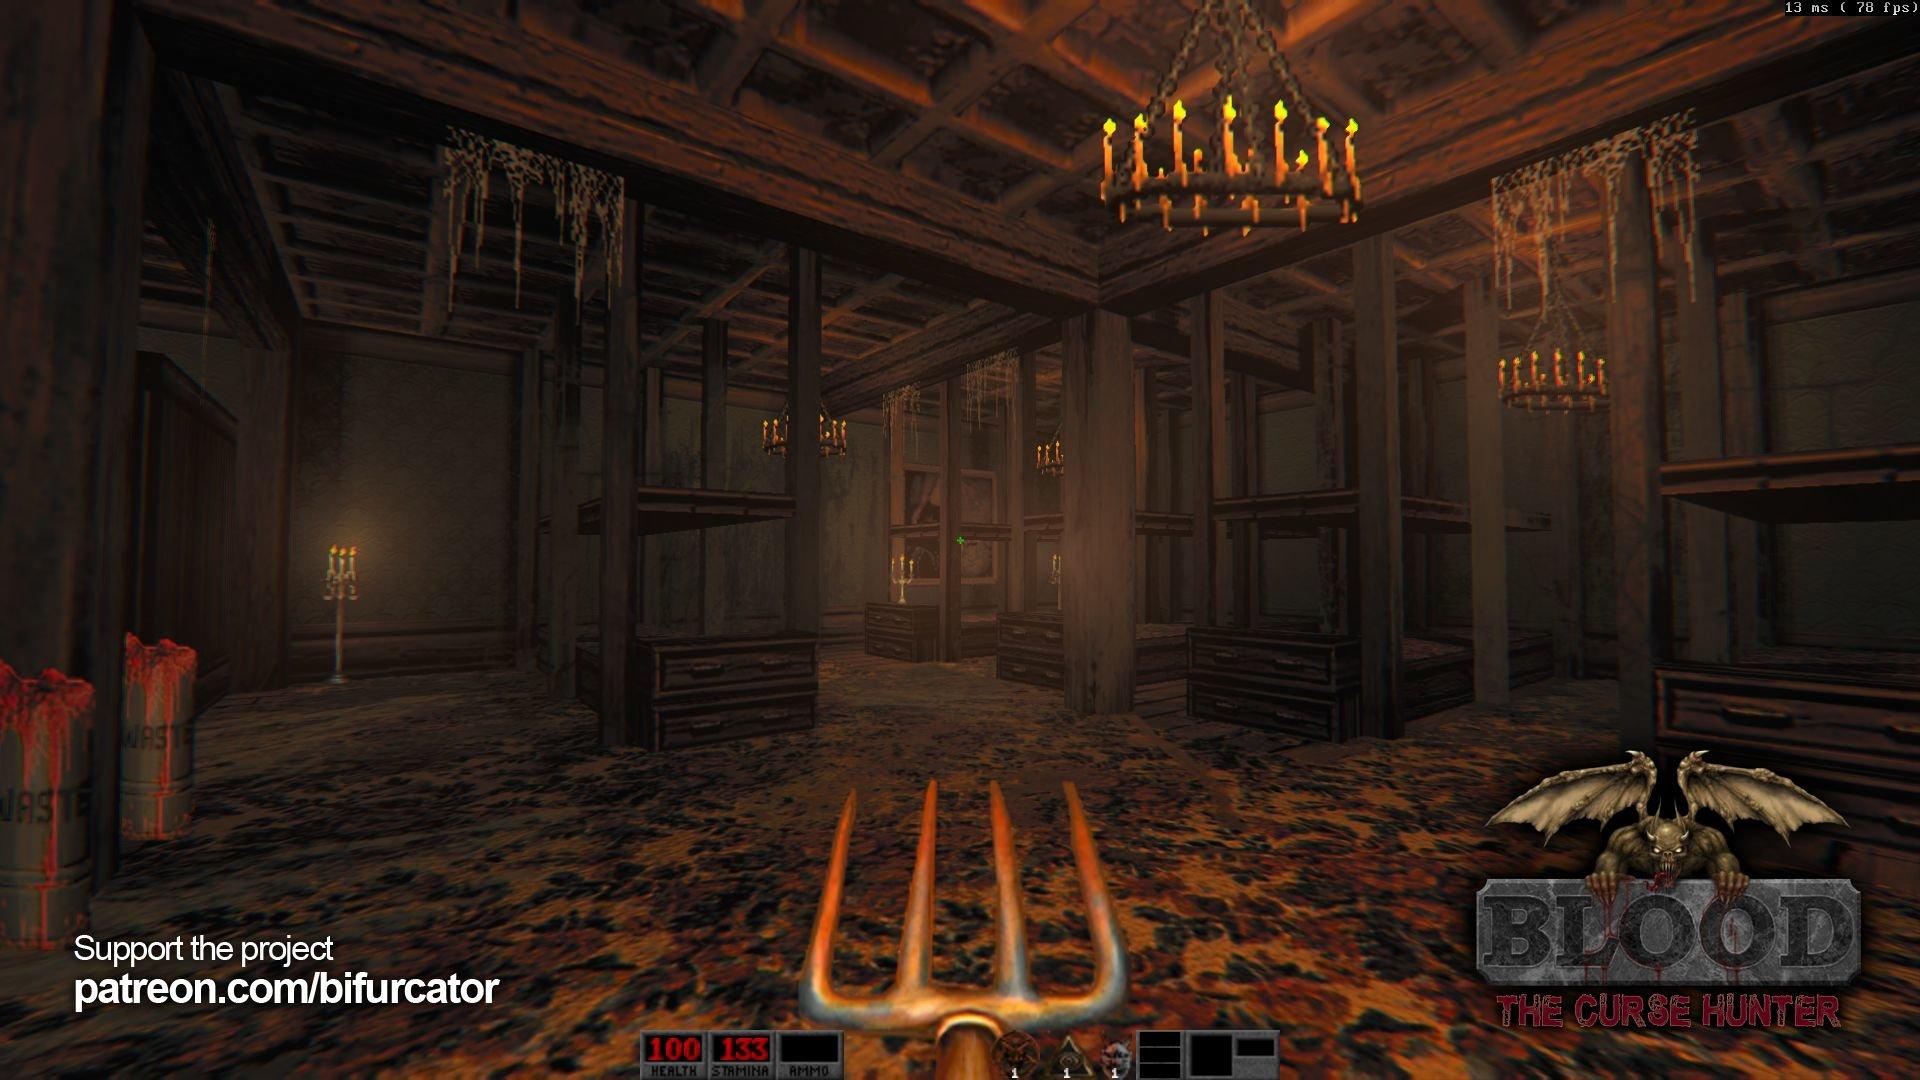 Screenshot_Doom_20190721_211239.jpg.1f4363a8428e0038ceec5b7f6a28beb0.jpg